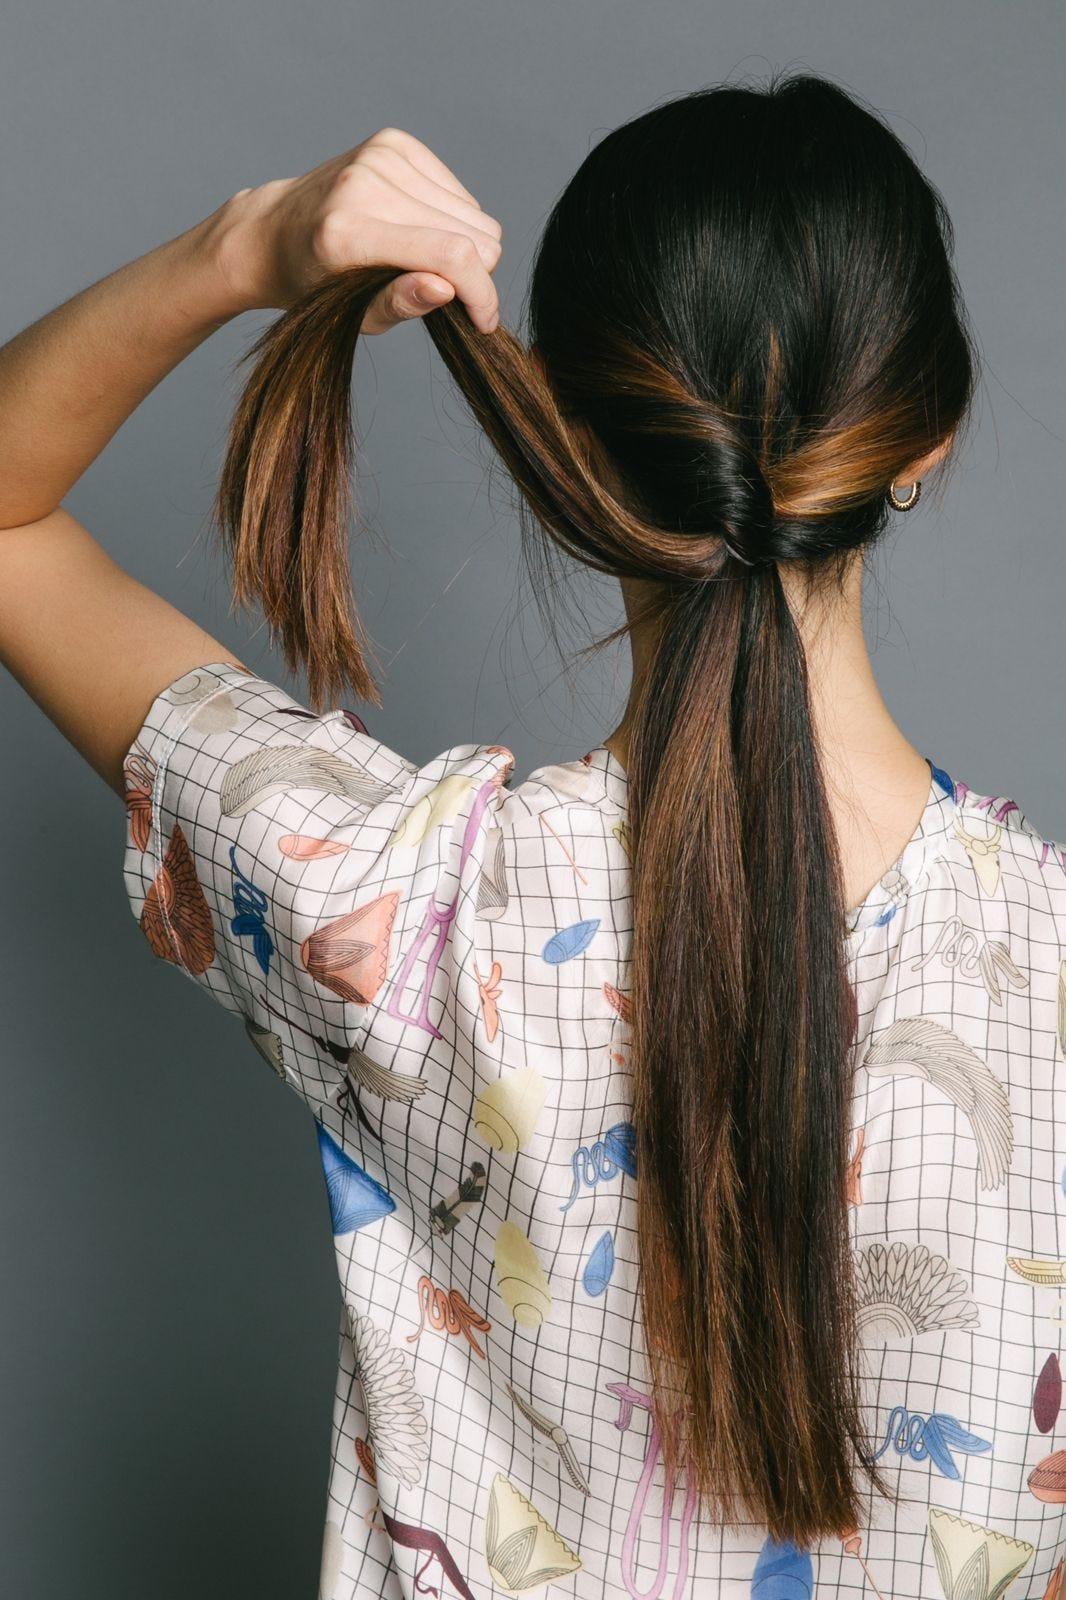 Strange Work Hairstyles Professional Hair Tutorials Short Hairstyles For Black Women Fulllsitofus